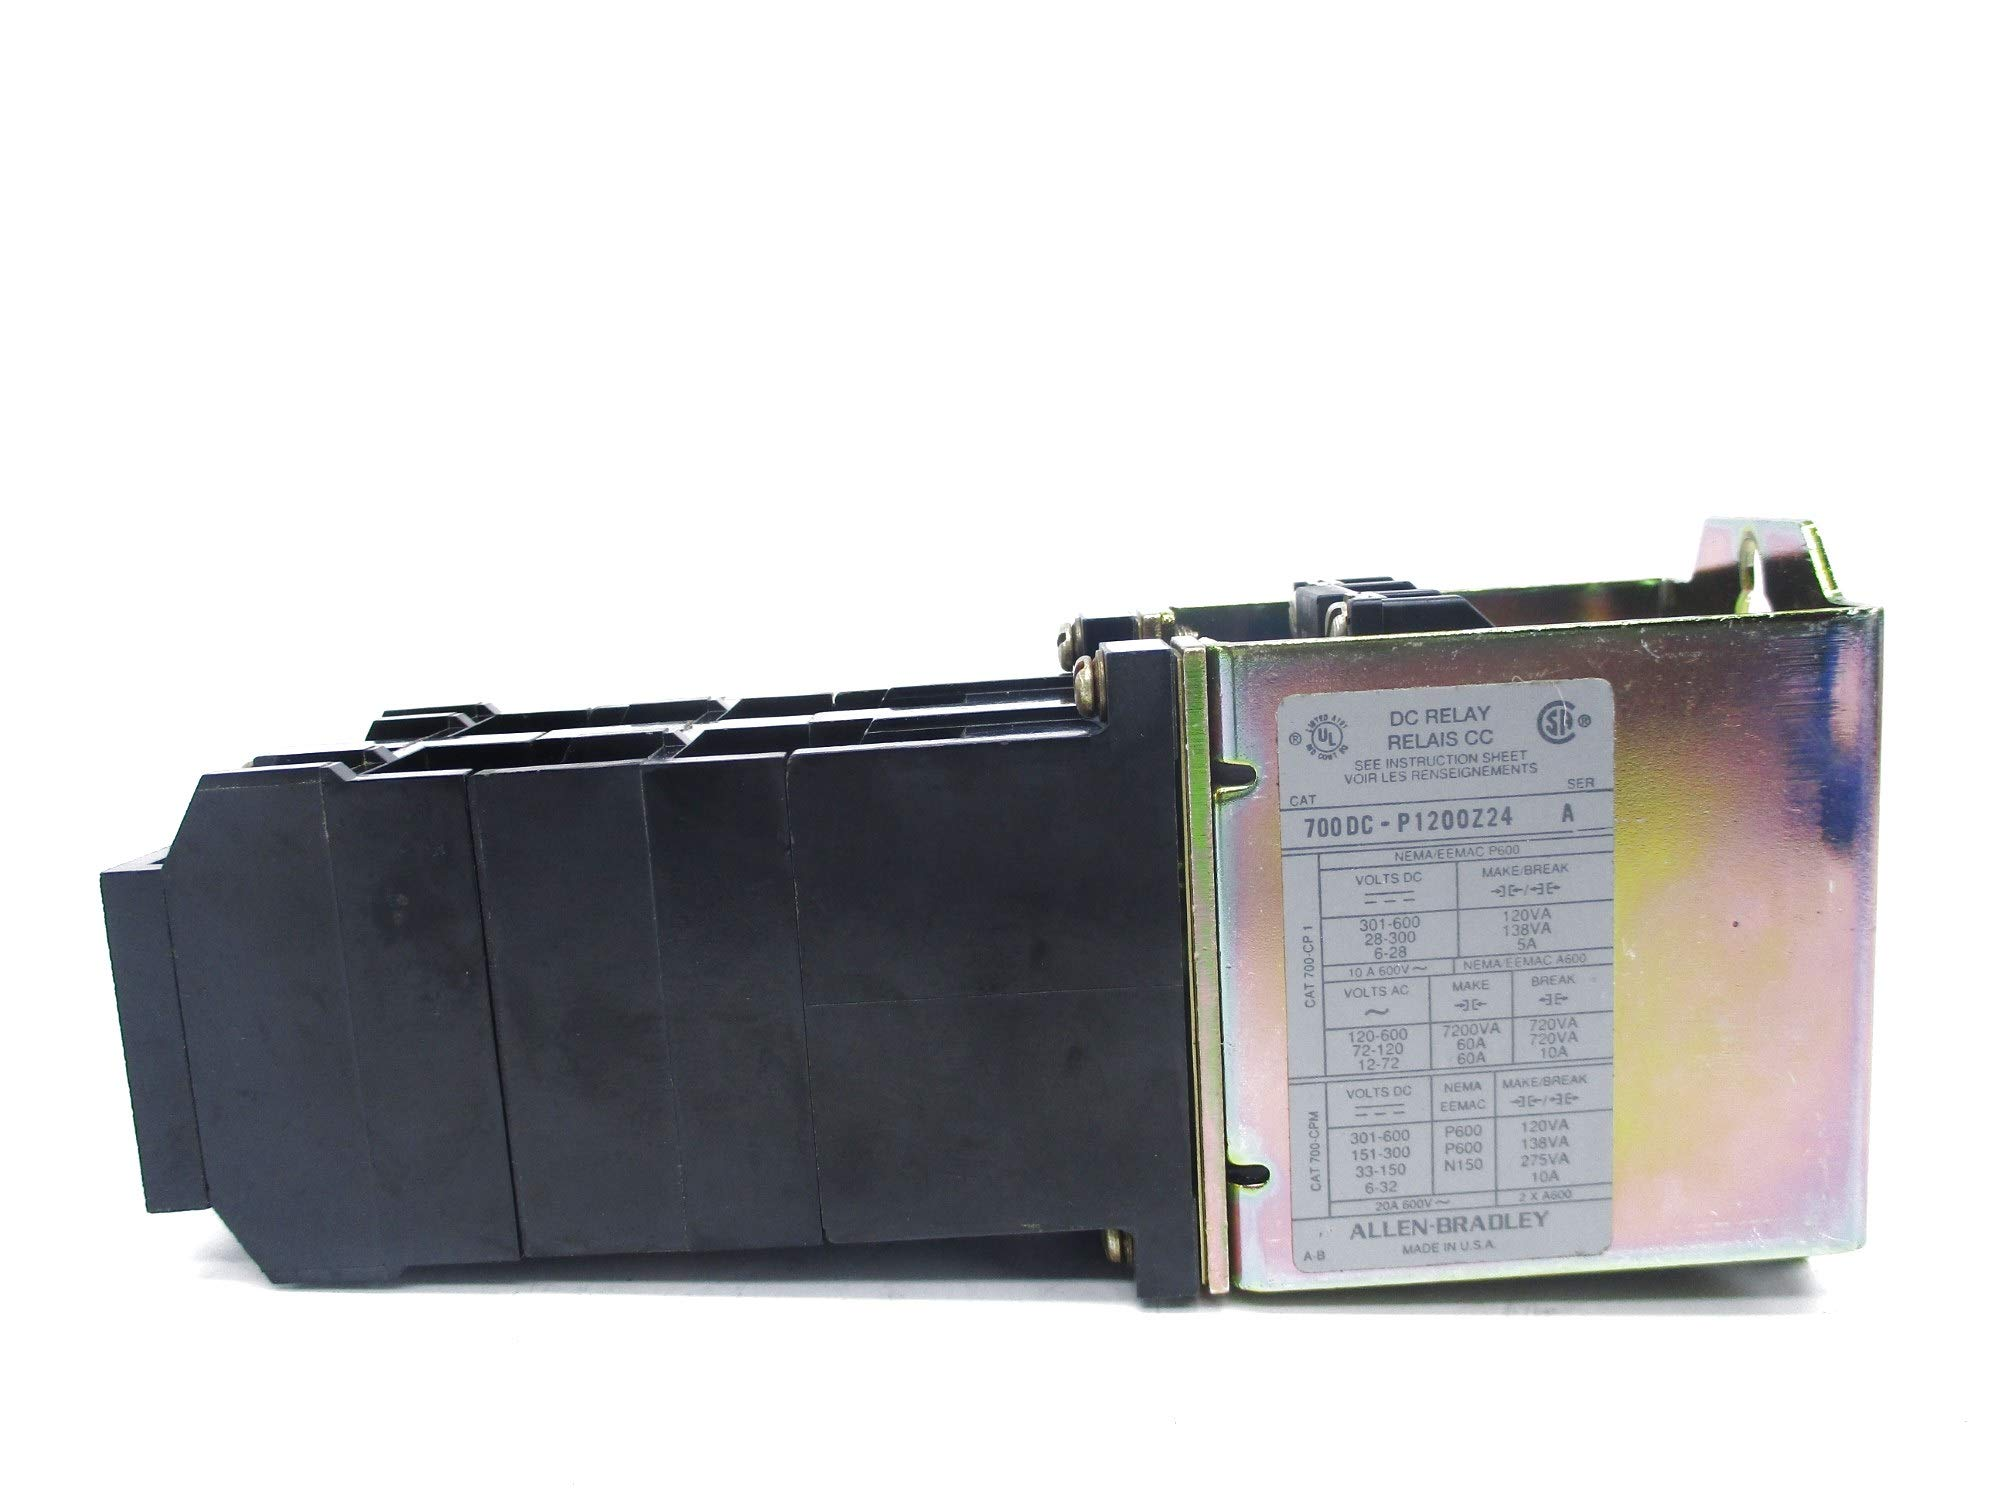 Allen Bradley 700DC-P1200Z24 SER. A 24V NSNP